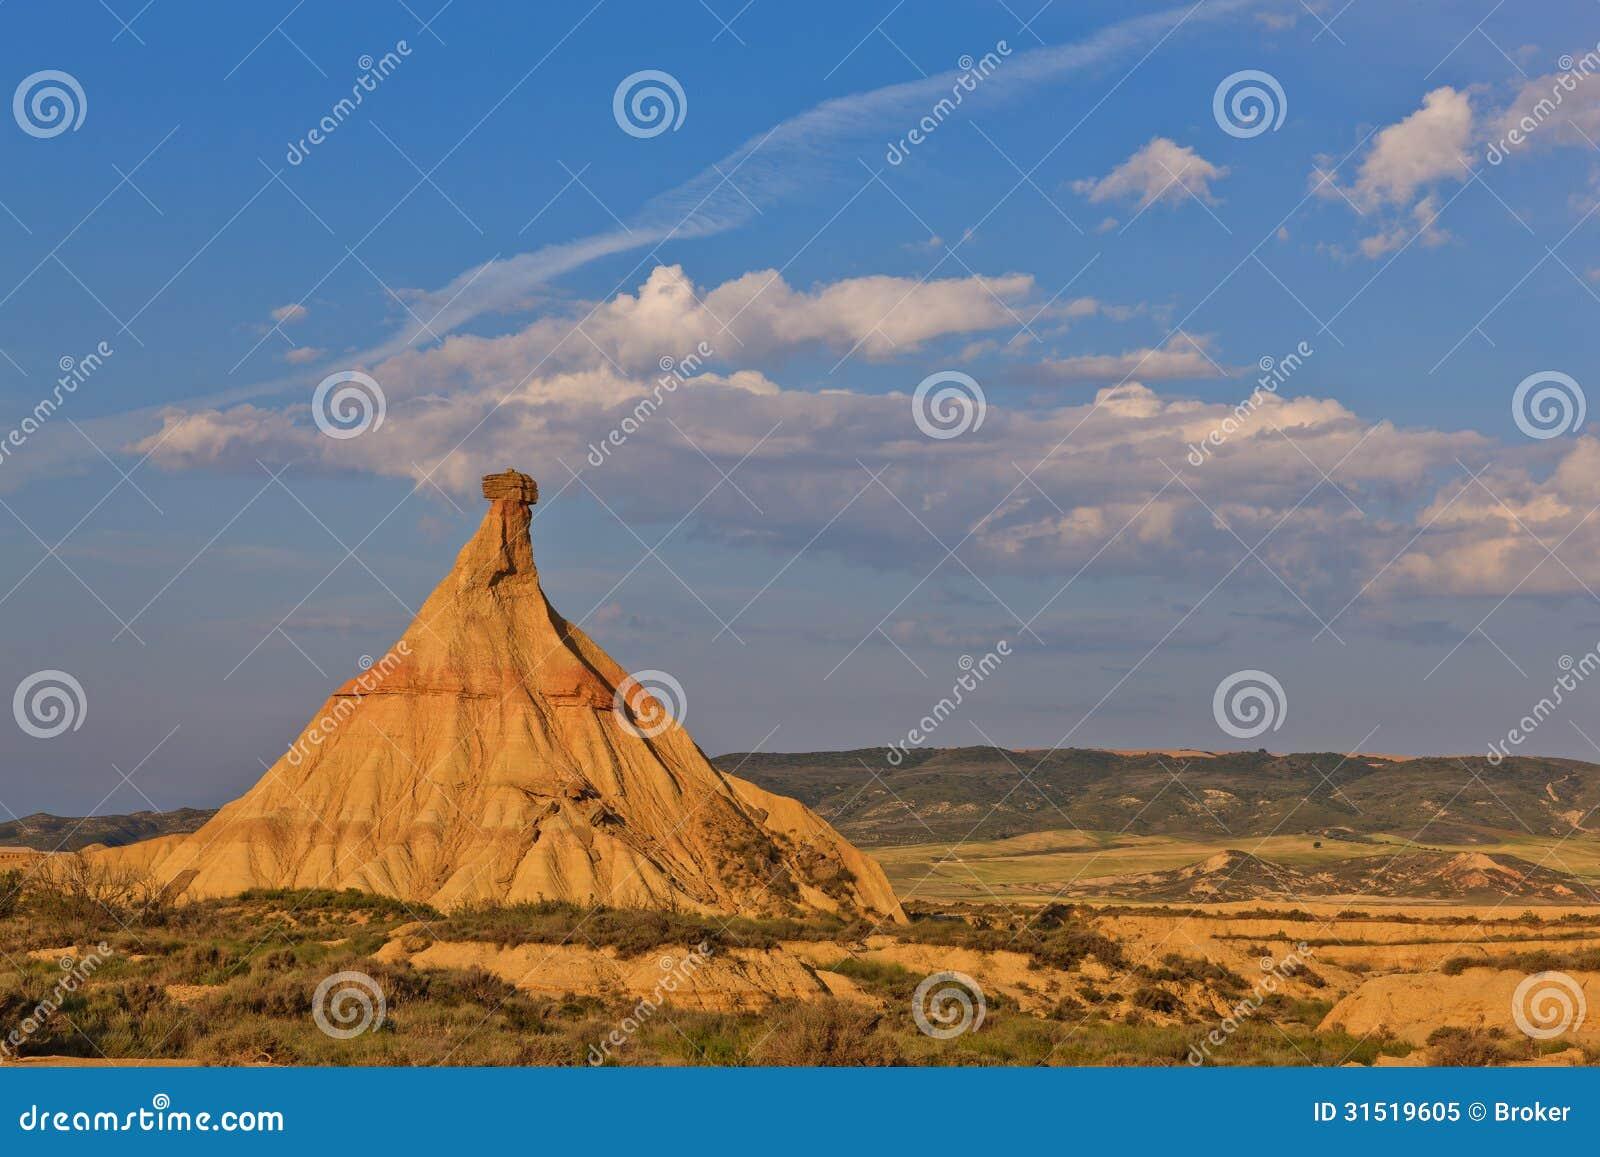 Desert landscape under the sunset colors